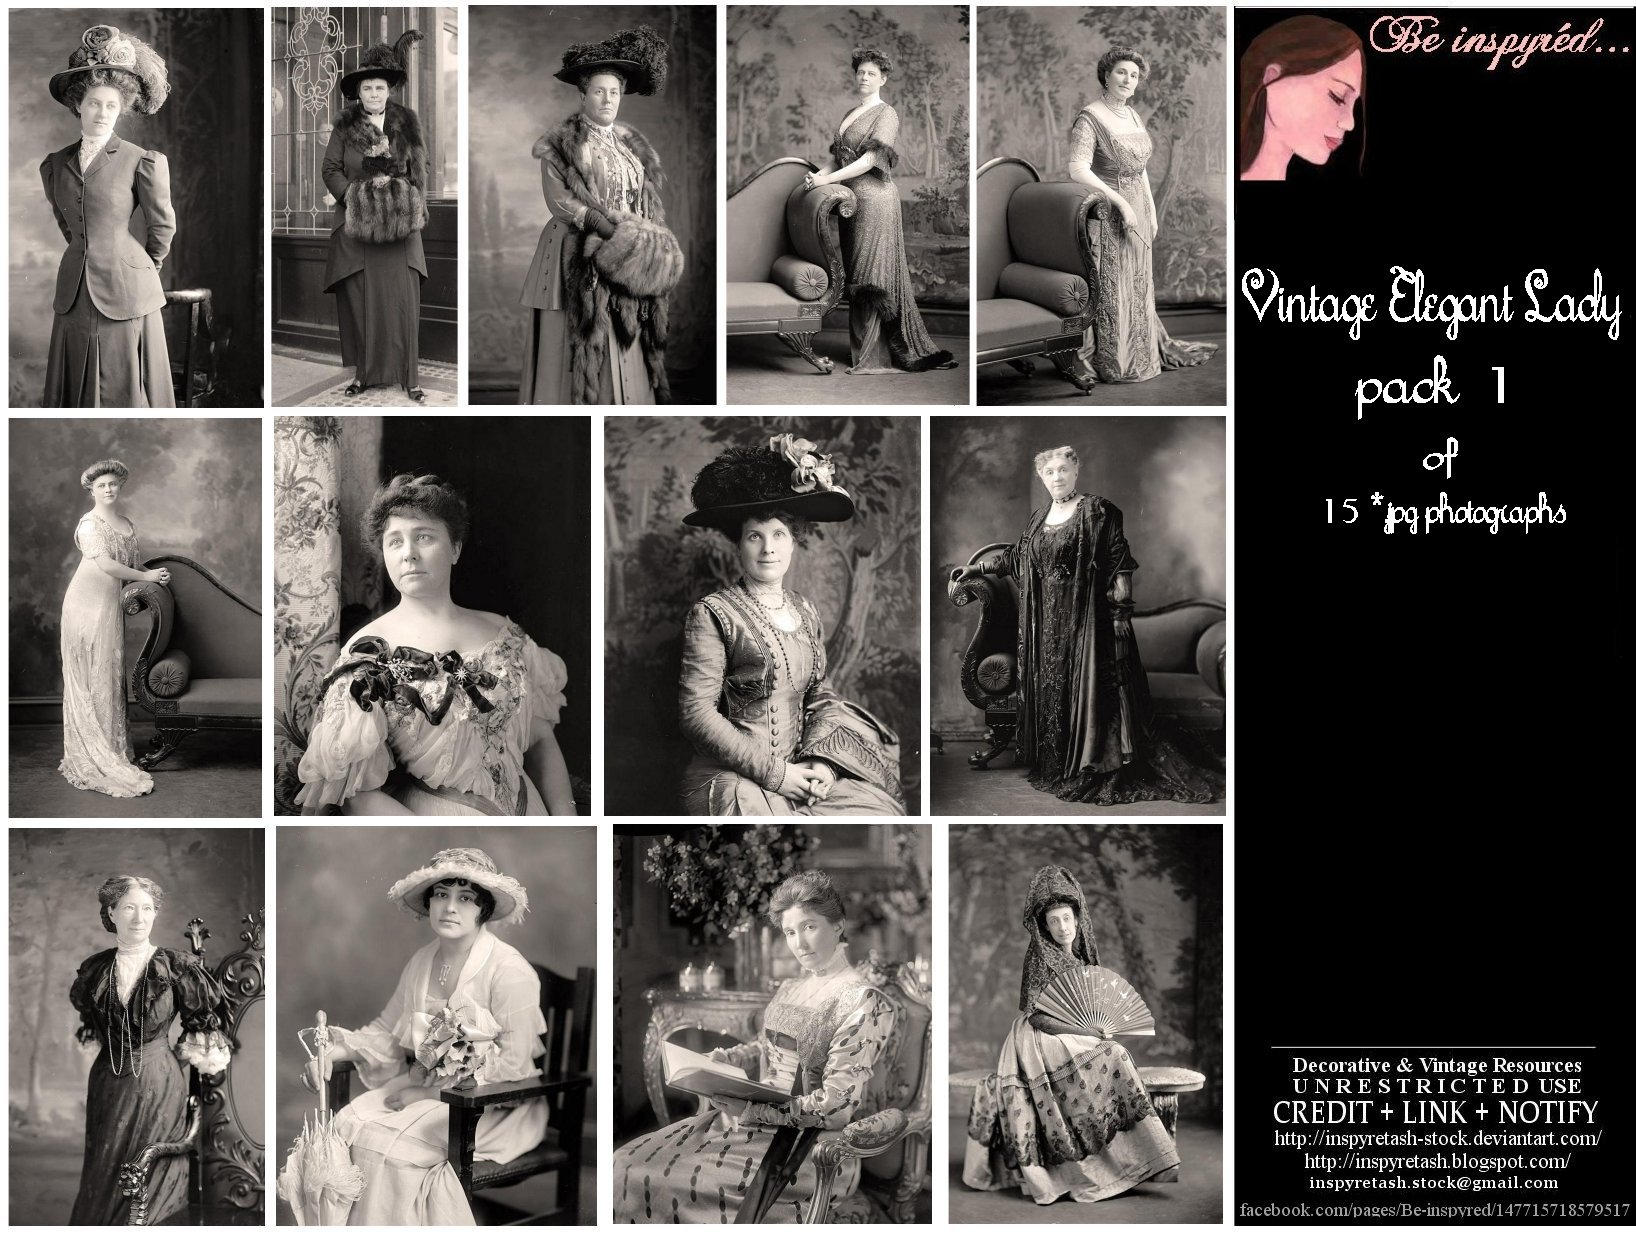 Vintage Elegant Lady Pk1 by Bnspyrd